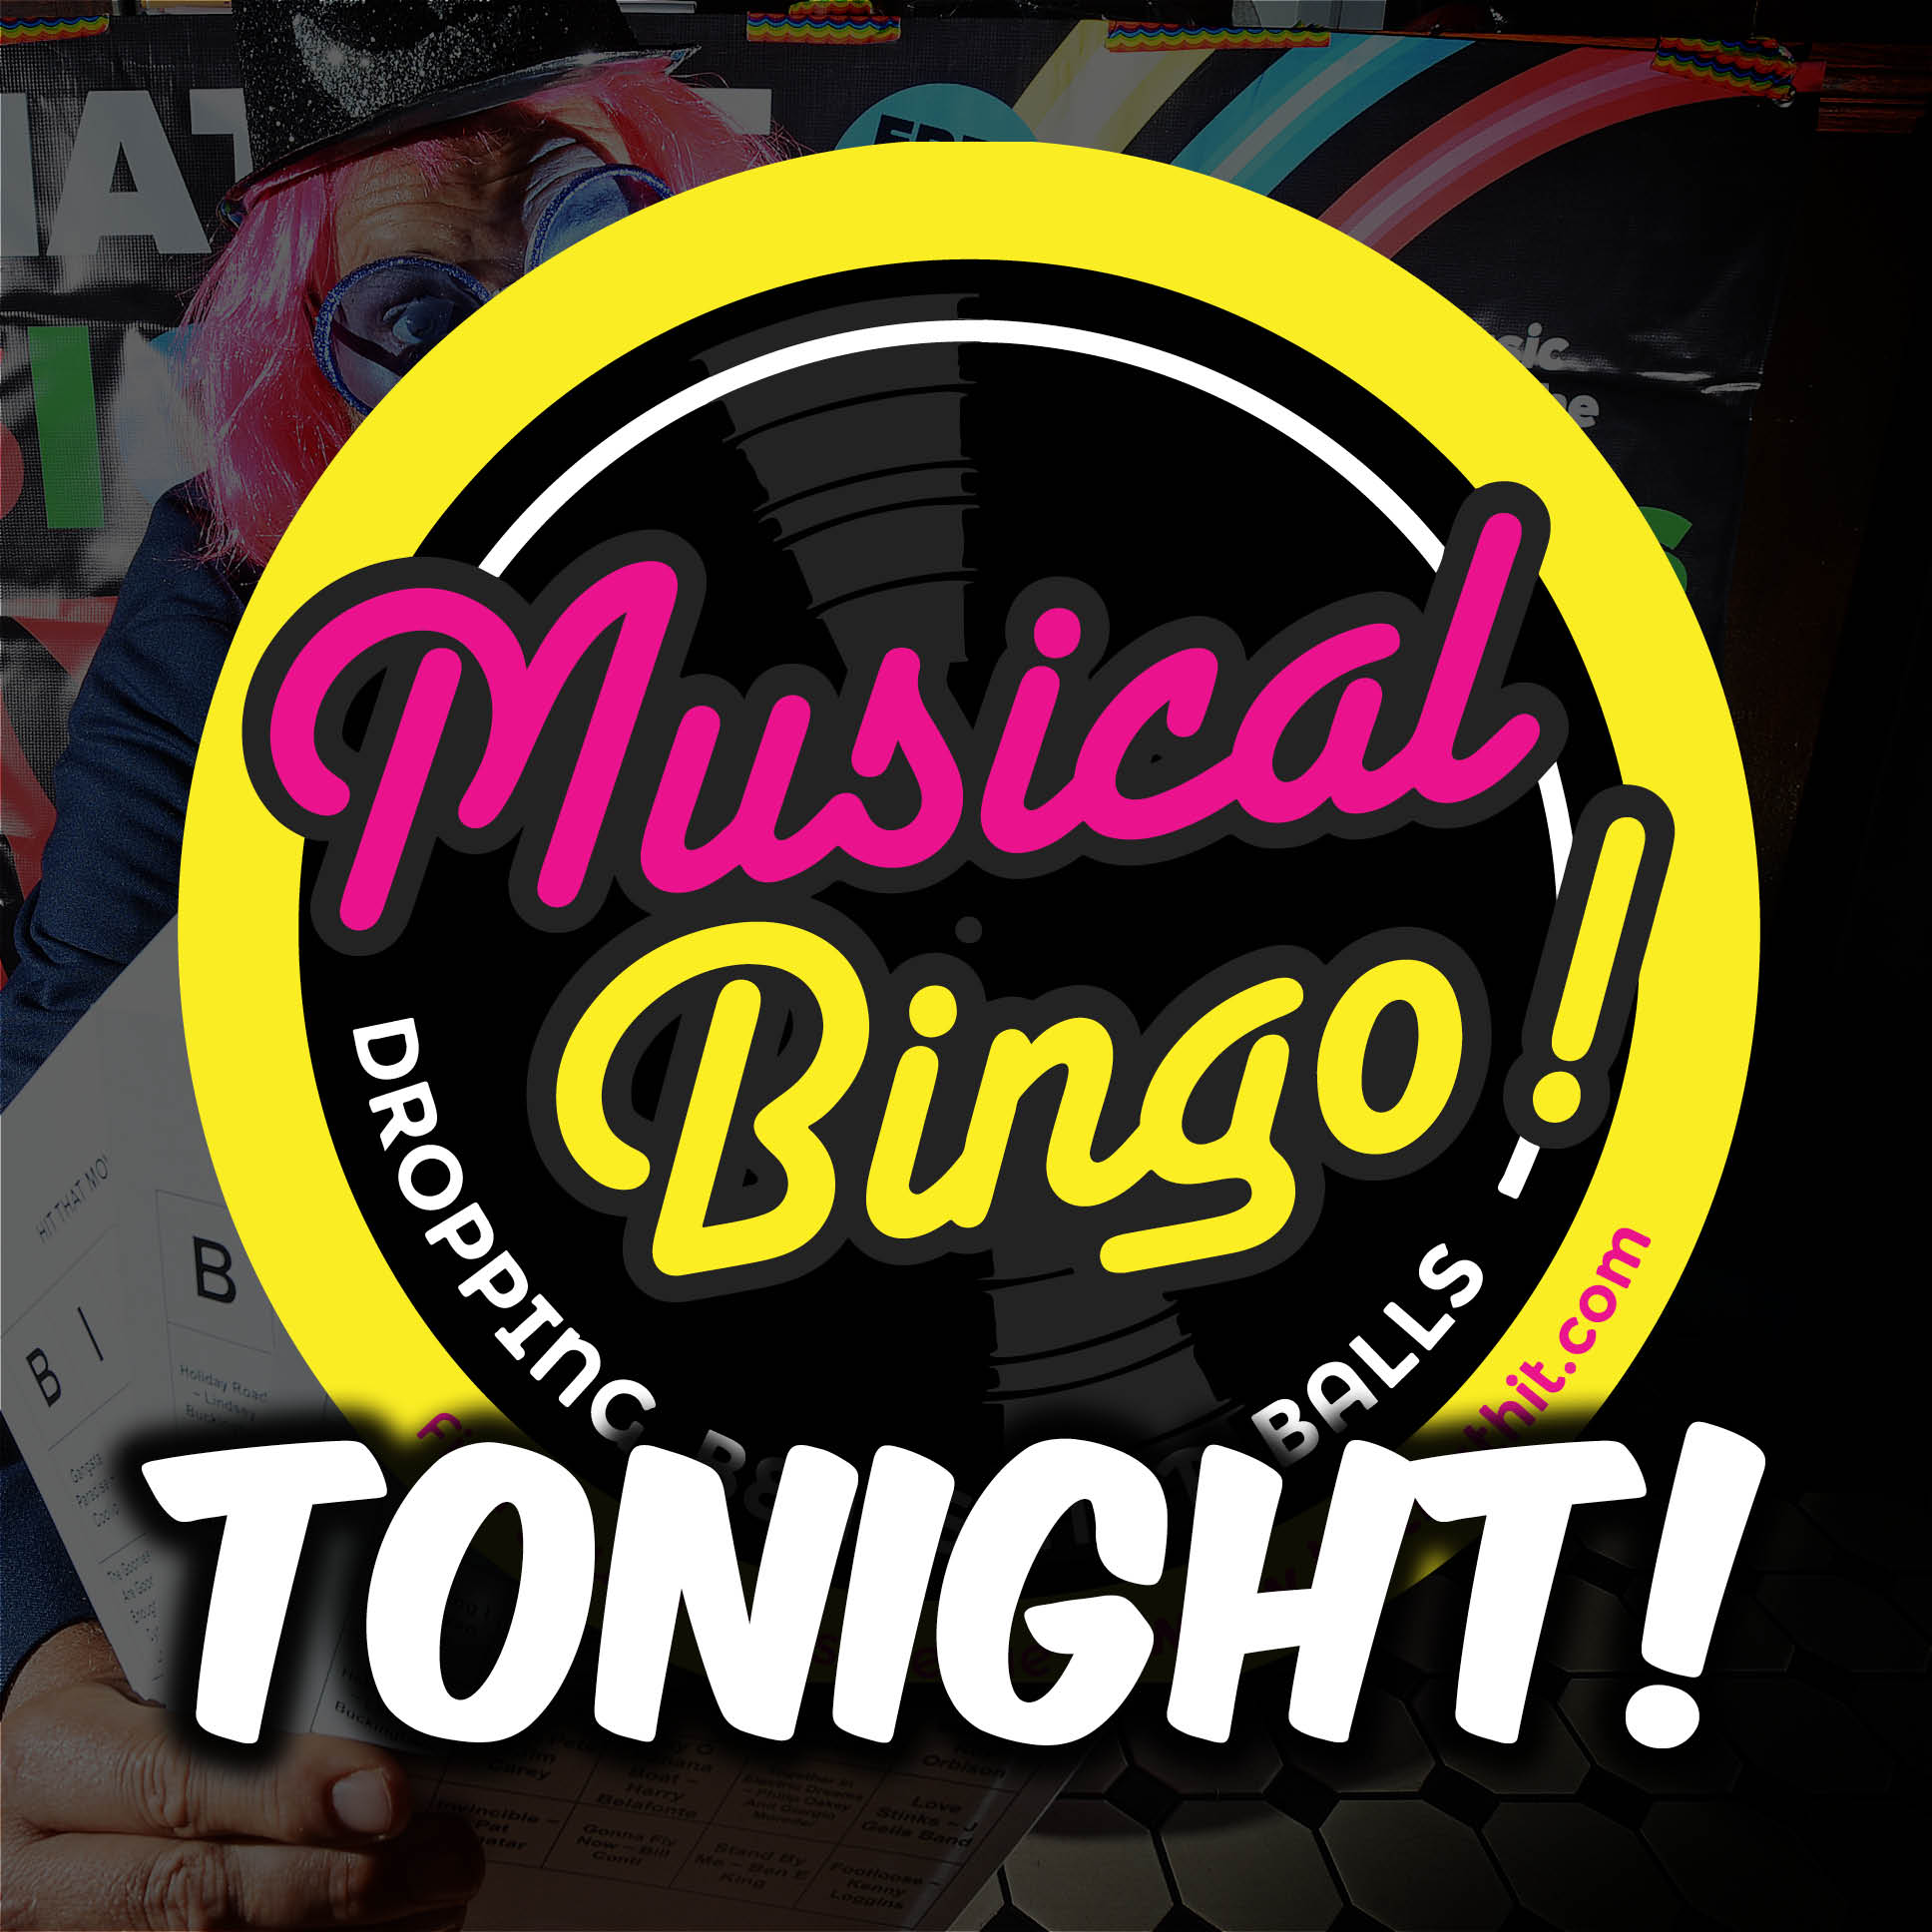 MUSICAL BINGO SOCIAL MEDIA & NIGHTLIFE17.jpg